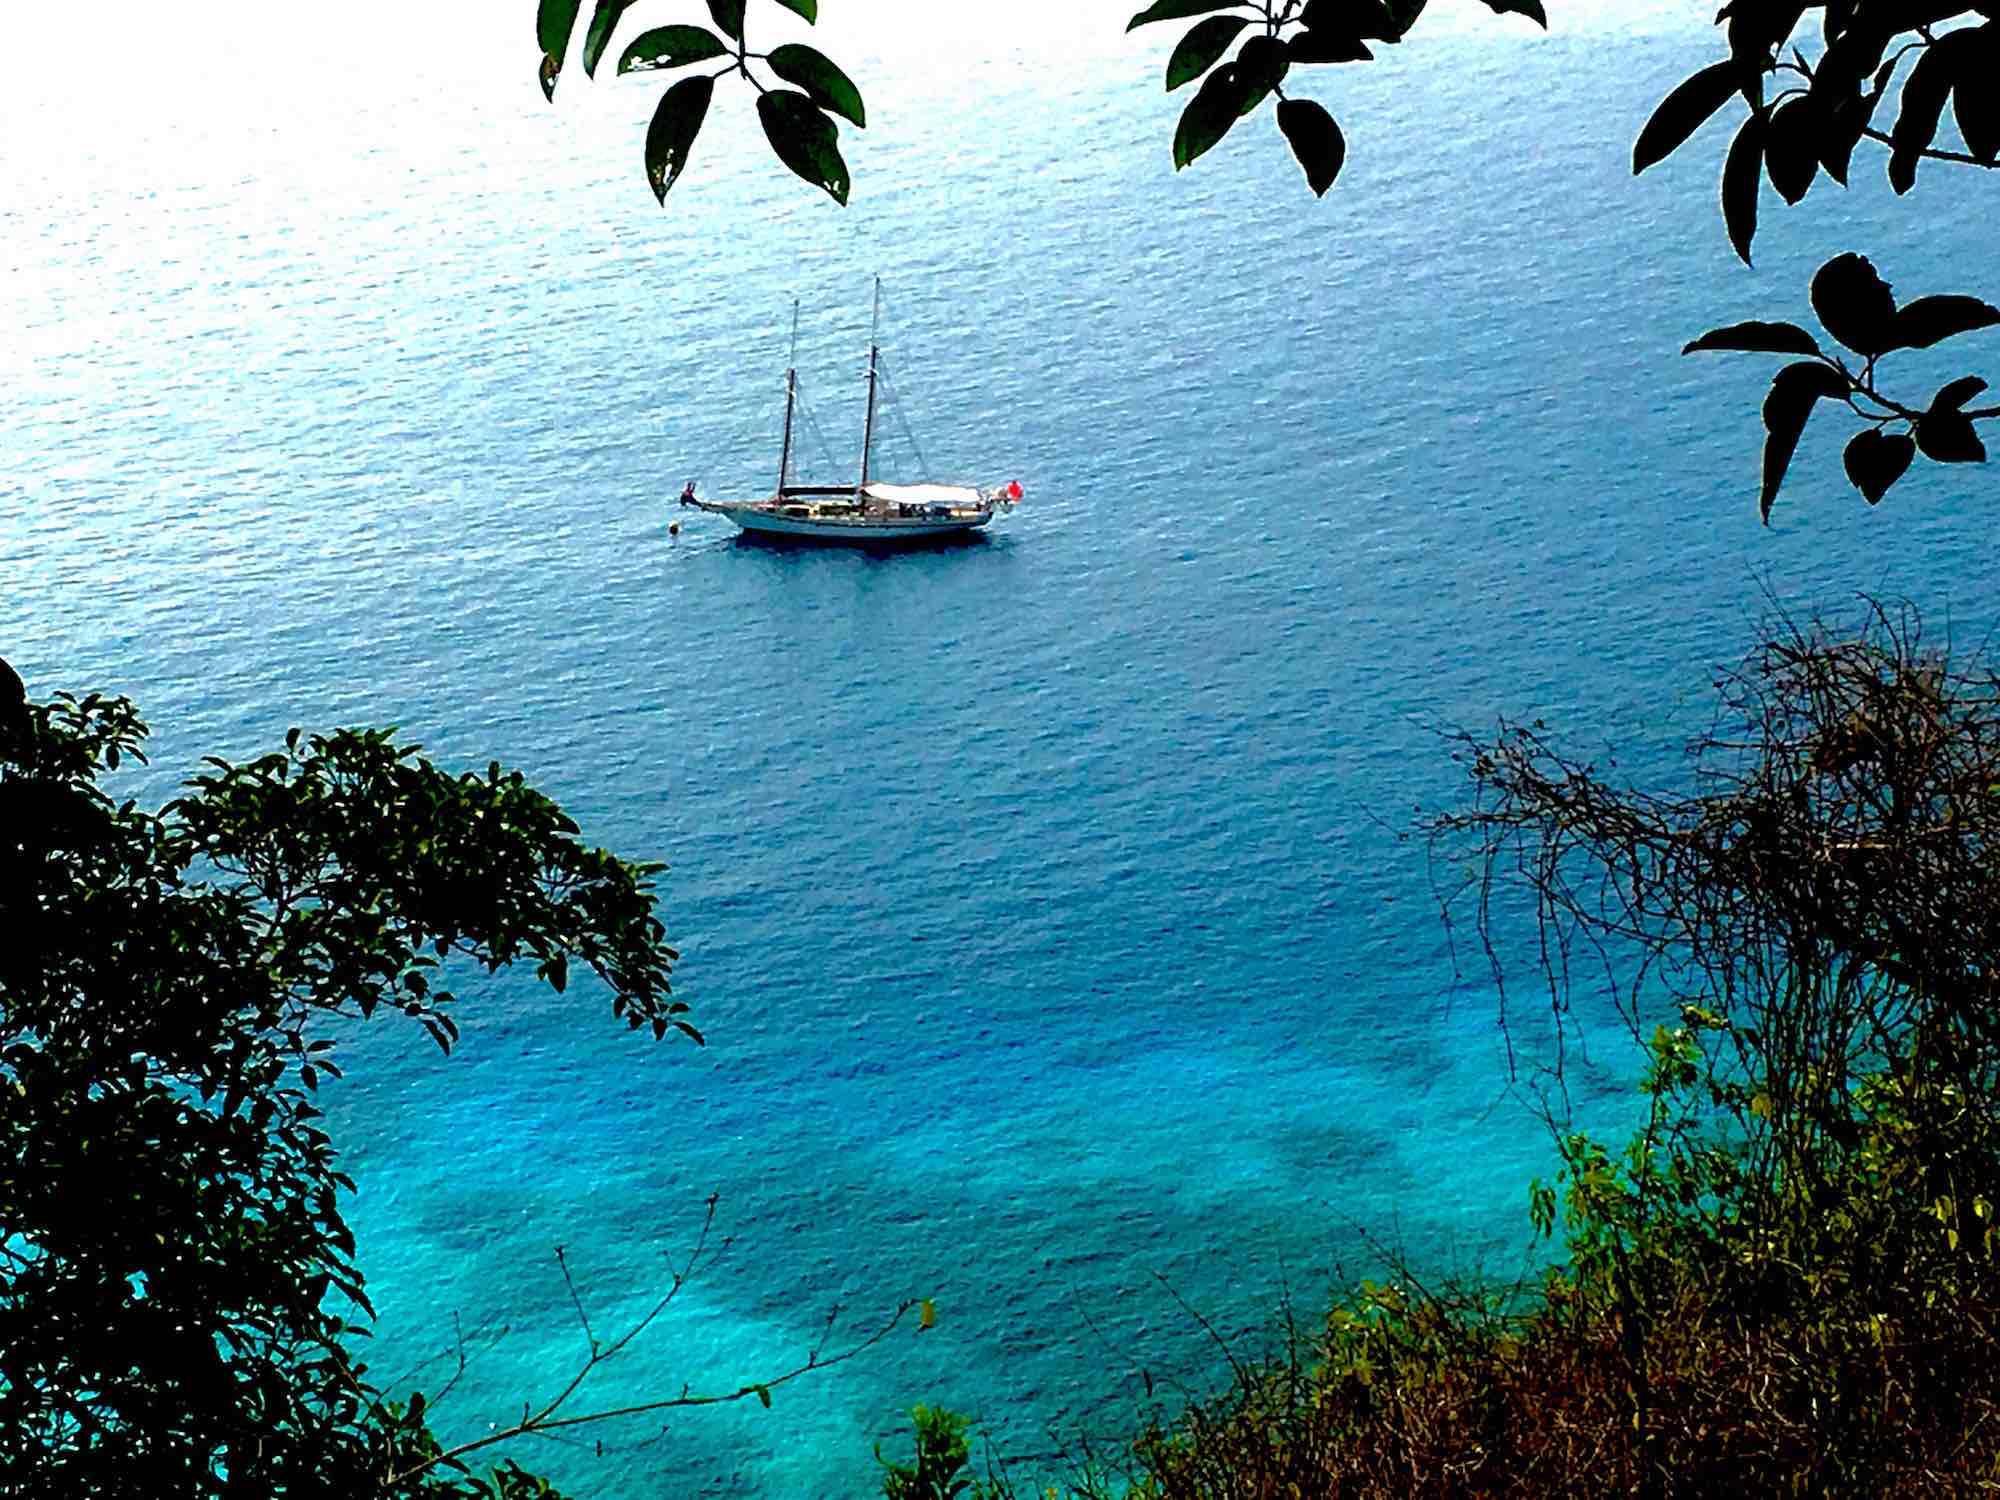 Dallinghoo_shot from island sailing on crystal blue waters in Mergui Myanmar_XS.jpeg